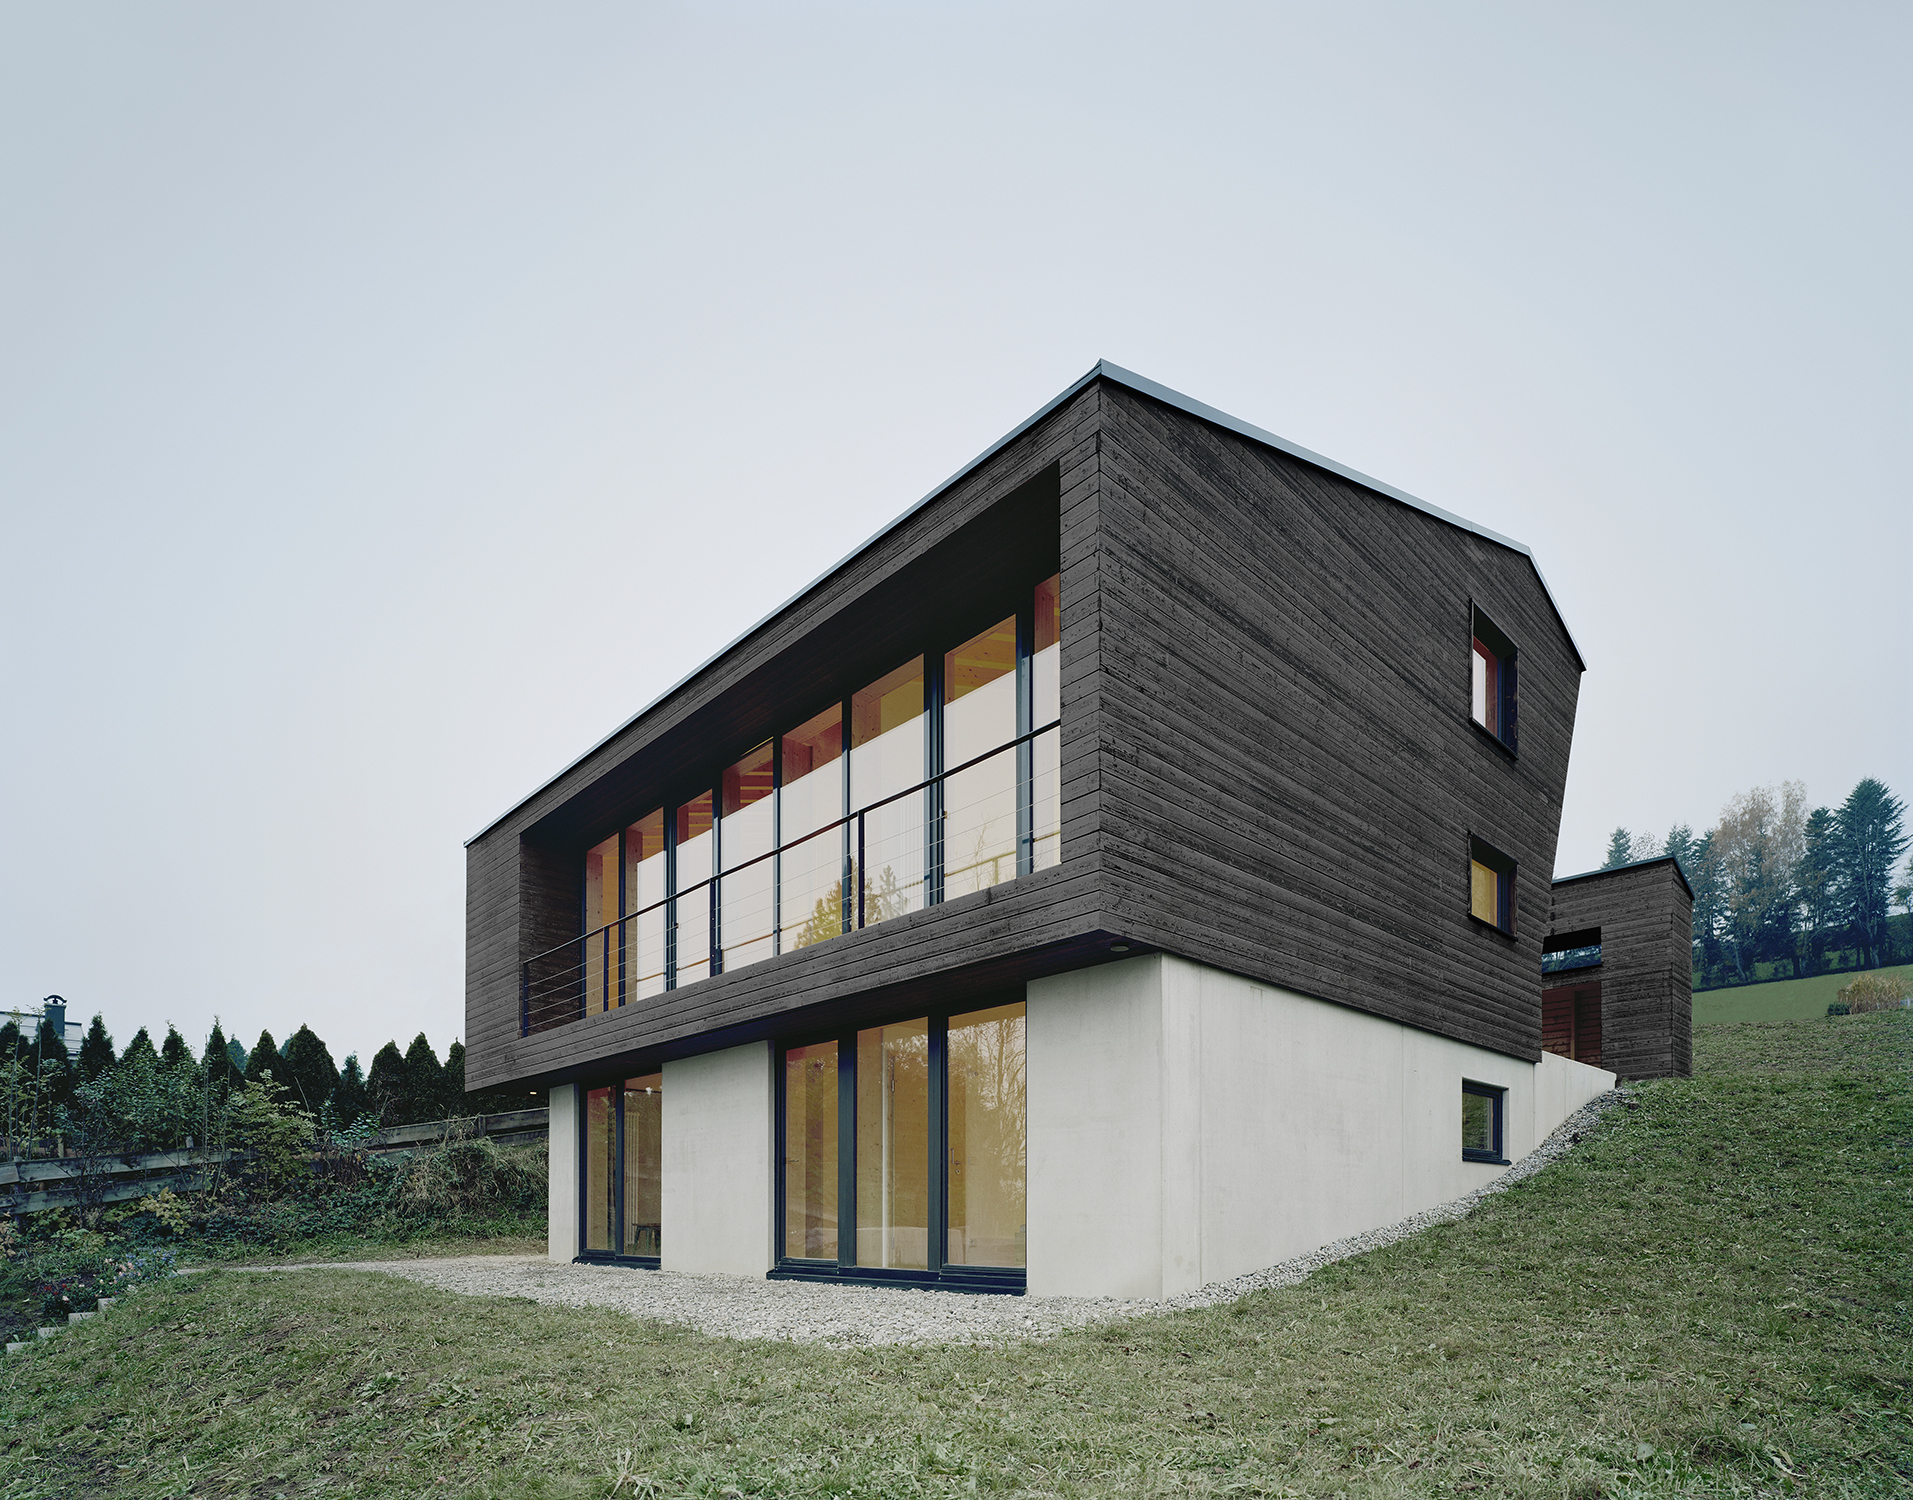 gallery of house p yonder architektur und design 4. Black Bedroom Furniture Sets. Home Design Ideas